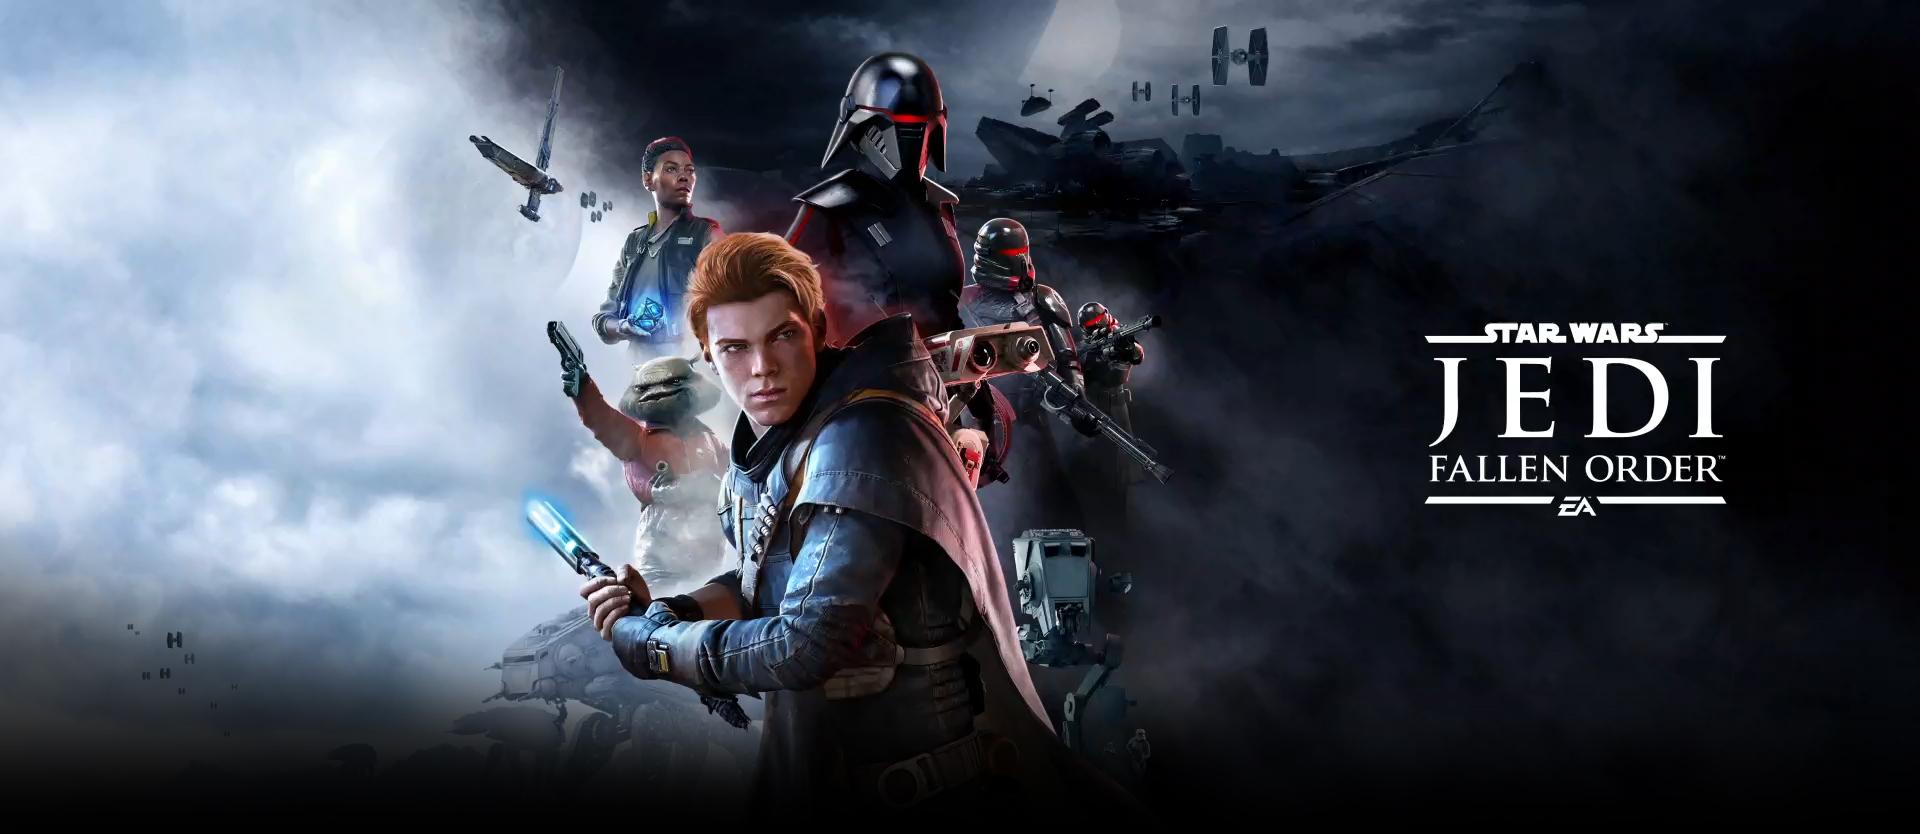 Star Wars Jedi: Fallen Order Video Game Review | Family ...